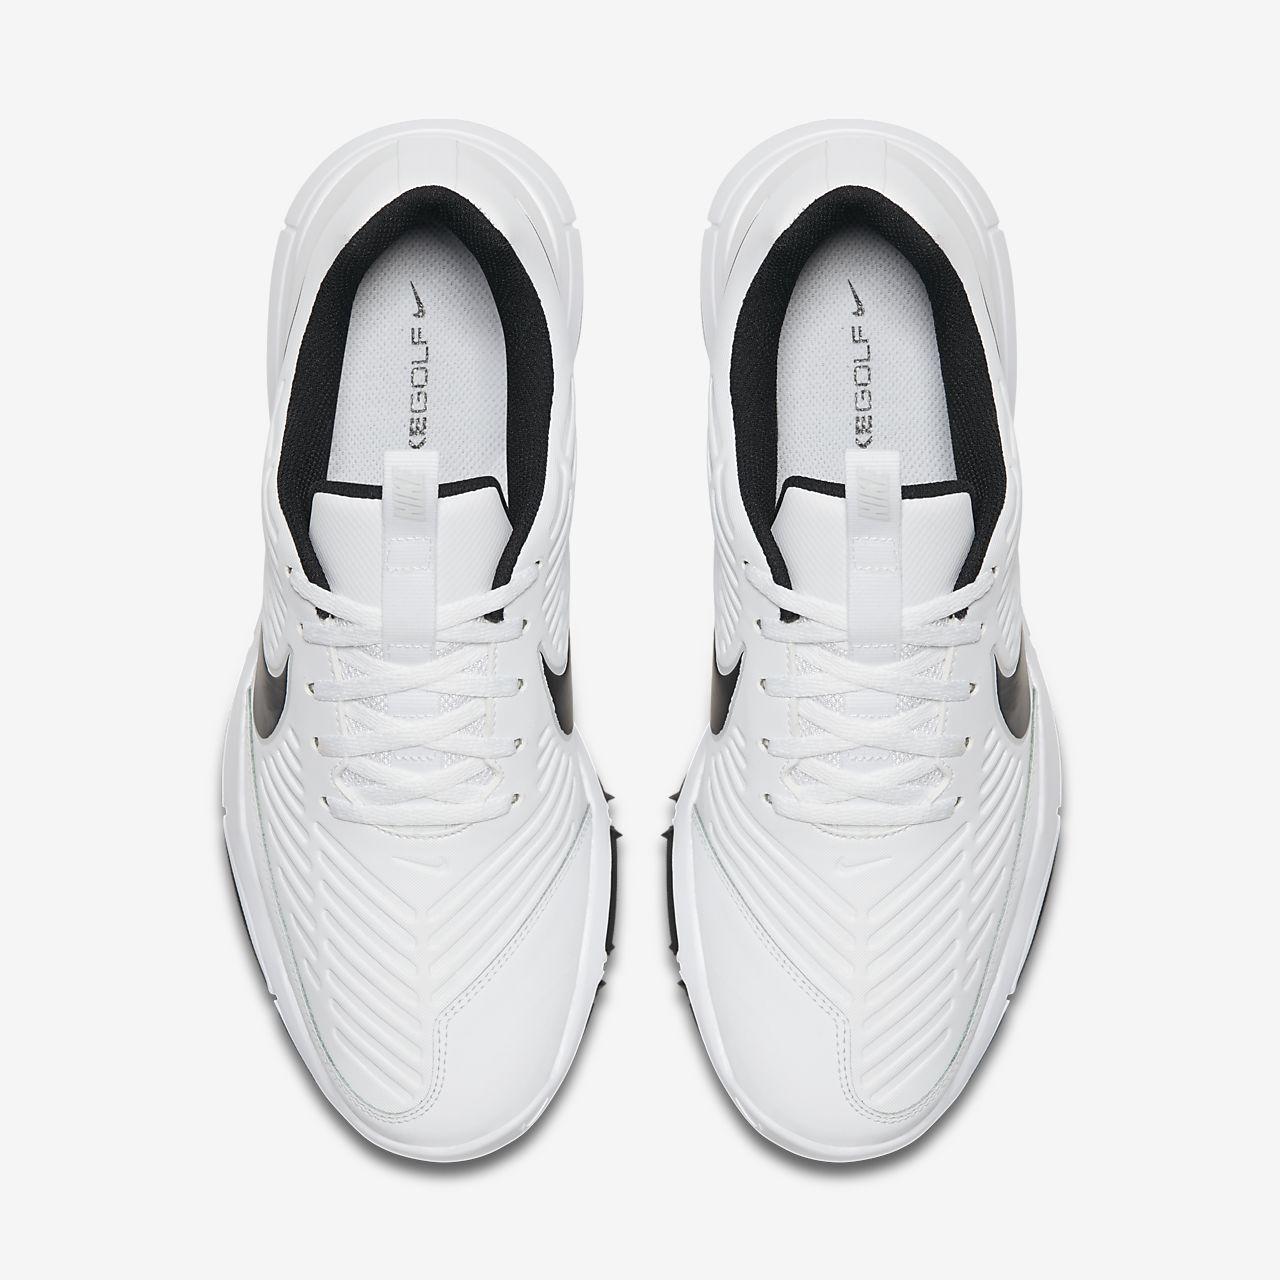 234d8bb1ac3c3a Nike Explorer 2 S Men s Golf Shoe. Nike.com GB